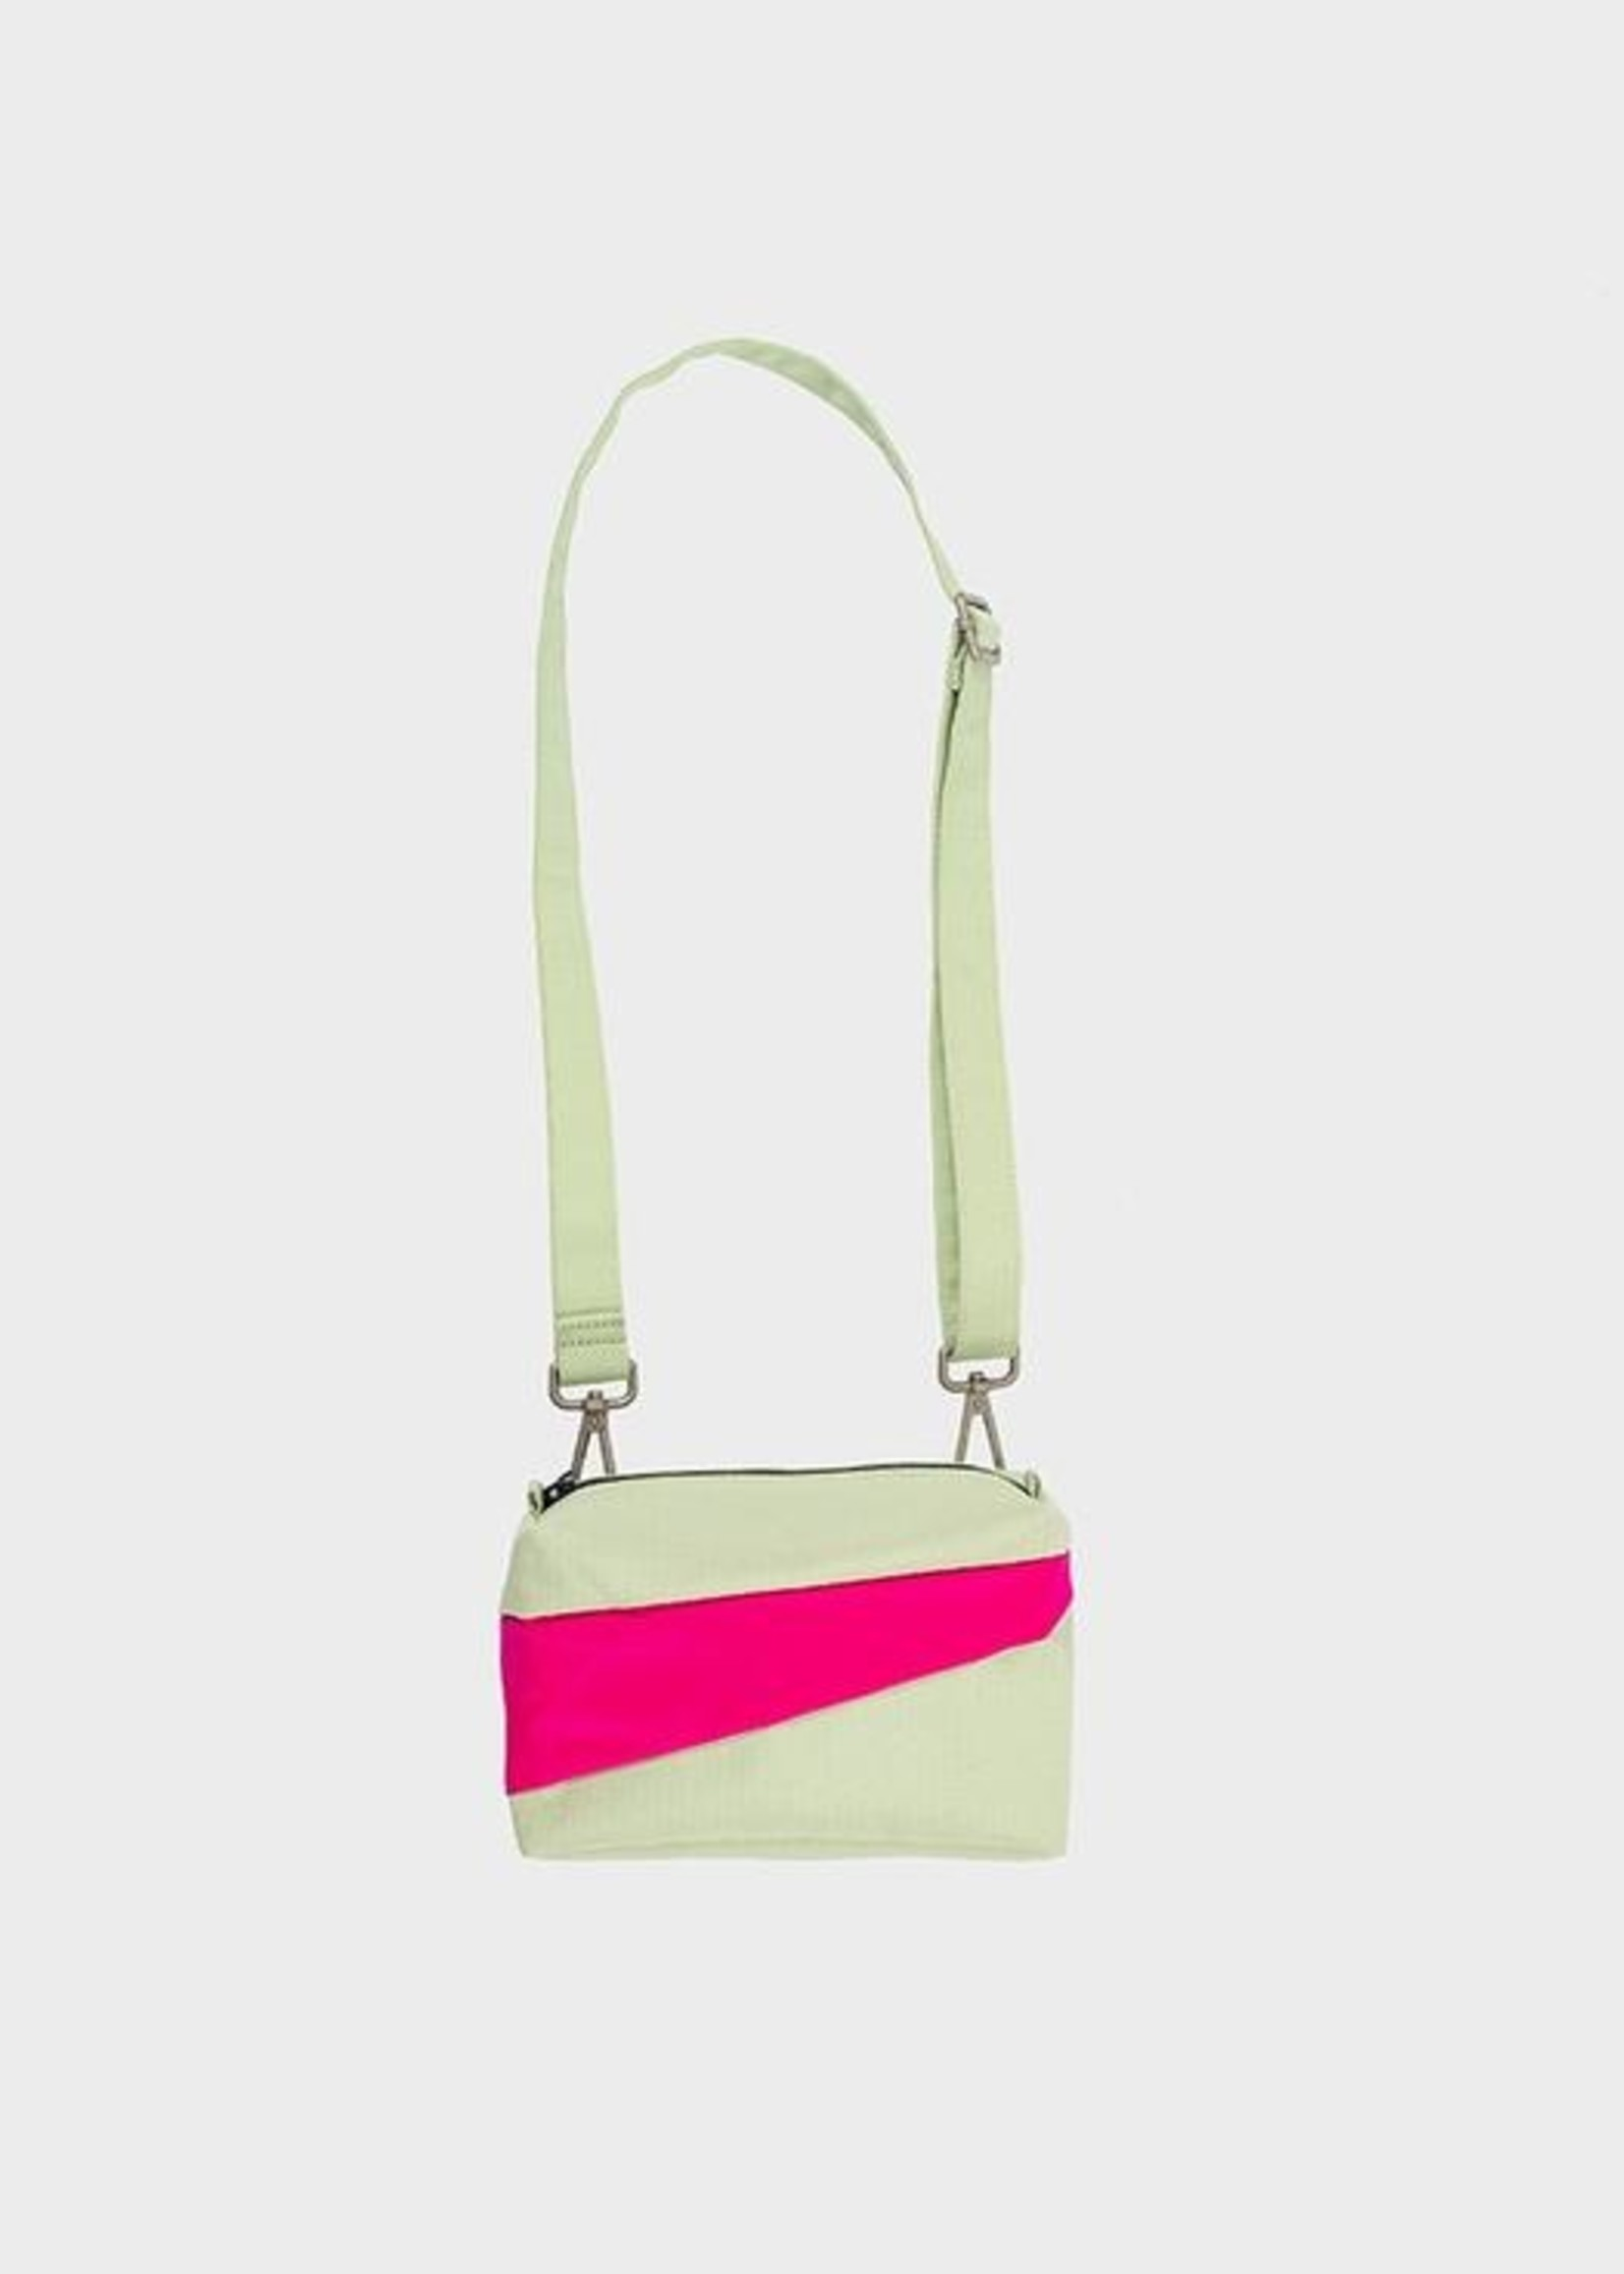 Bum bag - Small